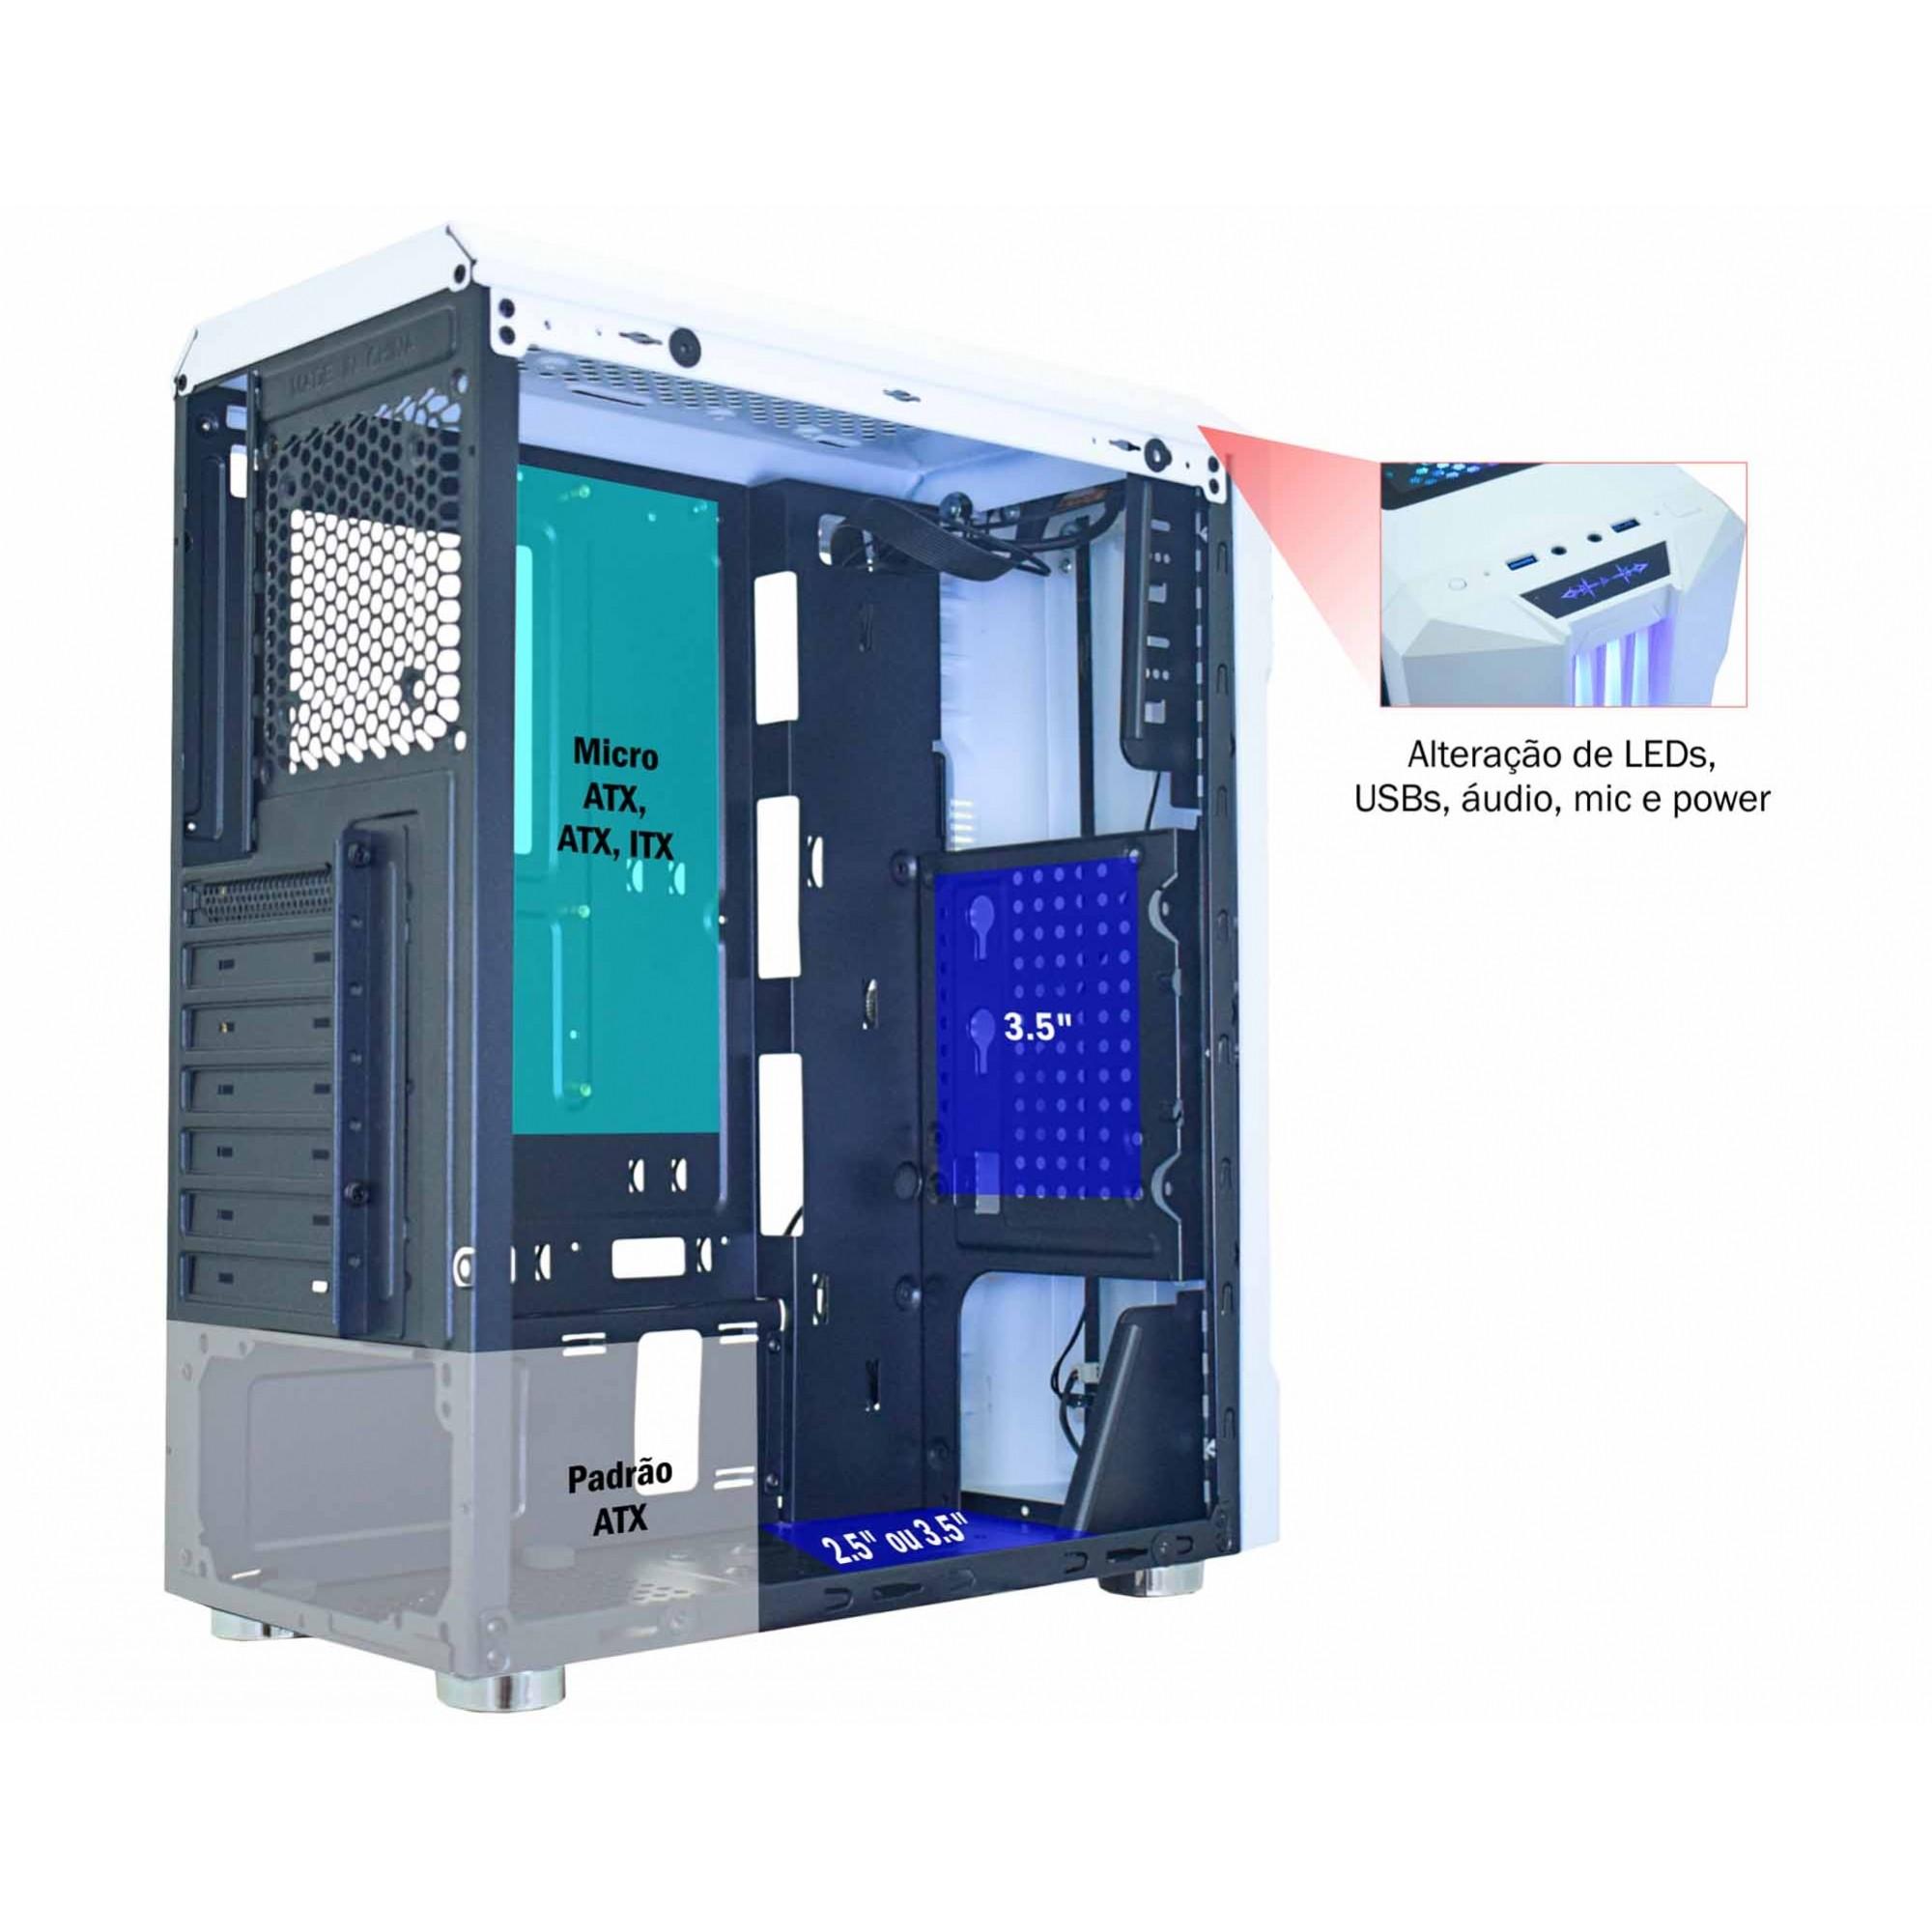 GABINETE GAMER MICRO ATX/ ATX/ ITX SEM FONTE BIFROST CG-04QI BRANCO/BARRA LED RGB K-MEX  - Fatality